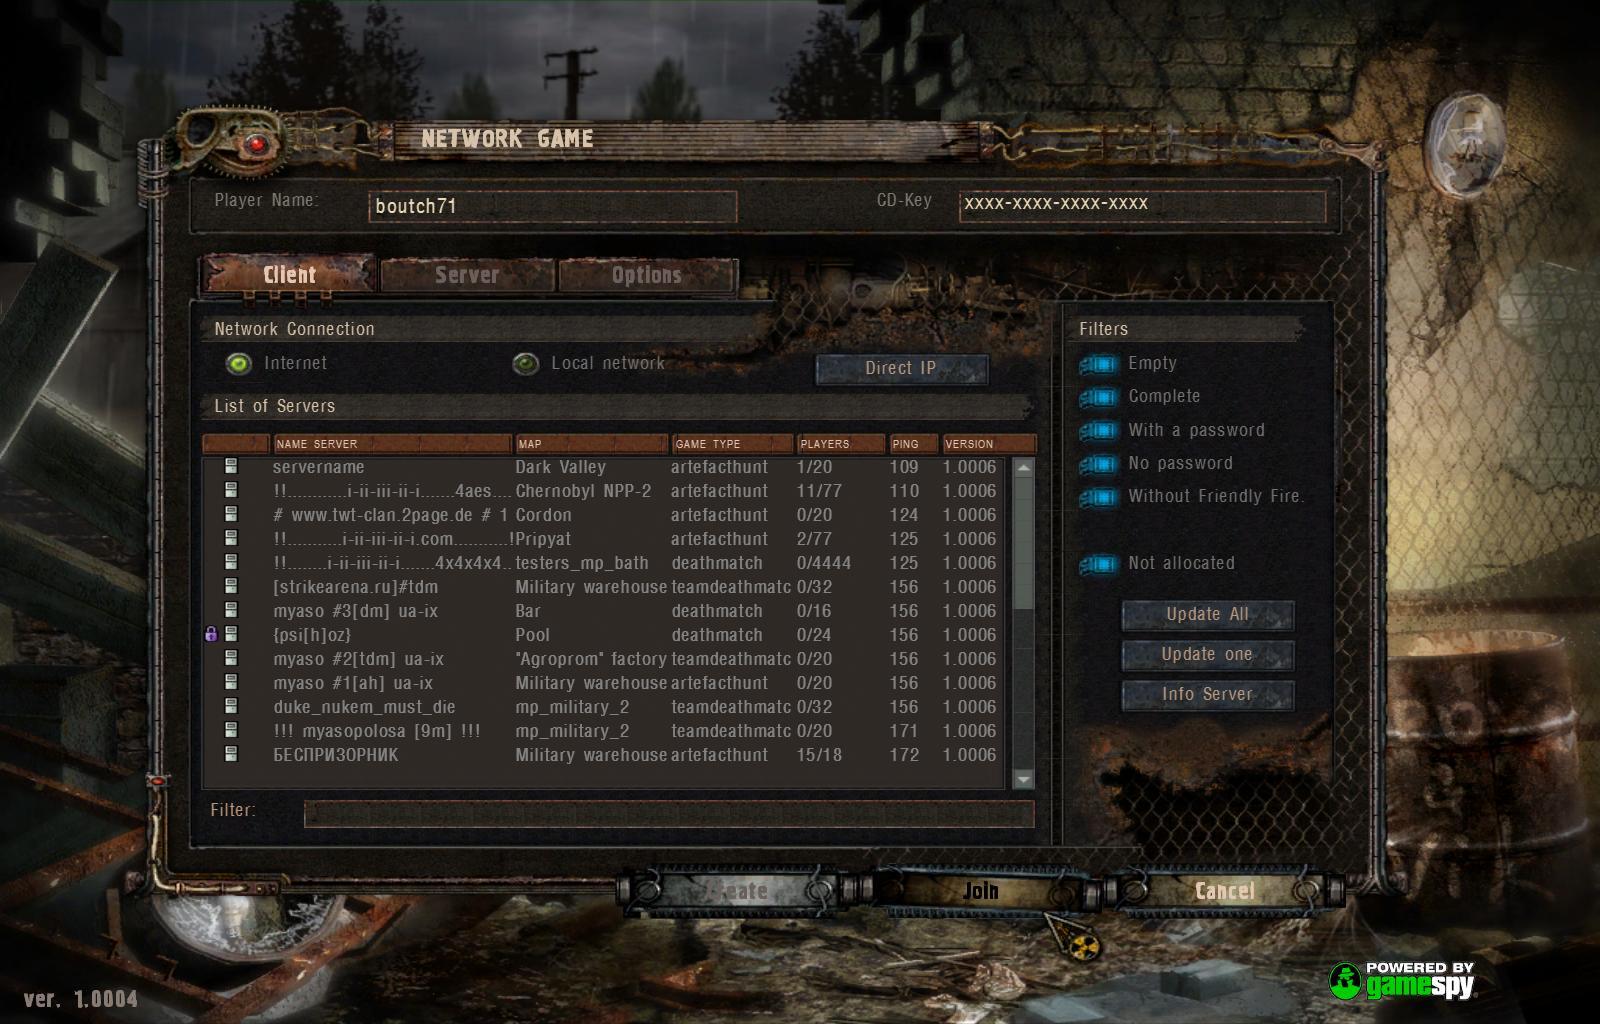 DMX 1.3.5 CRASH DESKTOP Cause a Server Gamespy! Ss_bou71